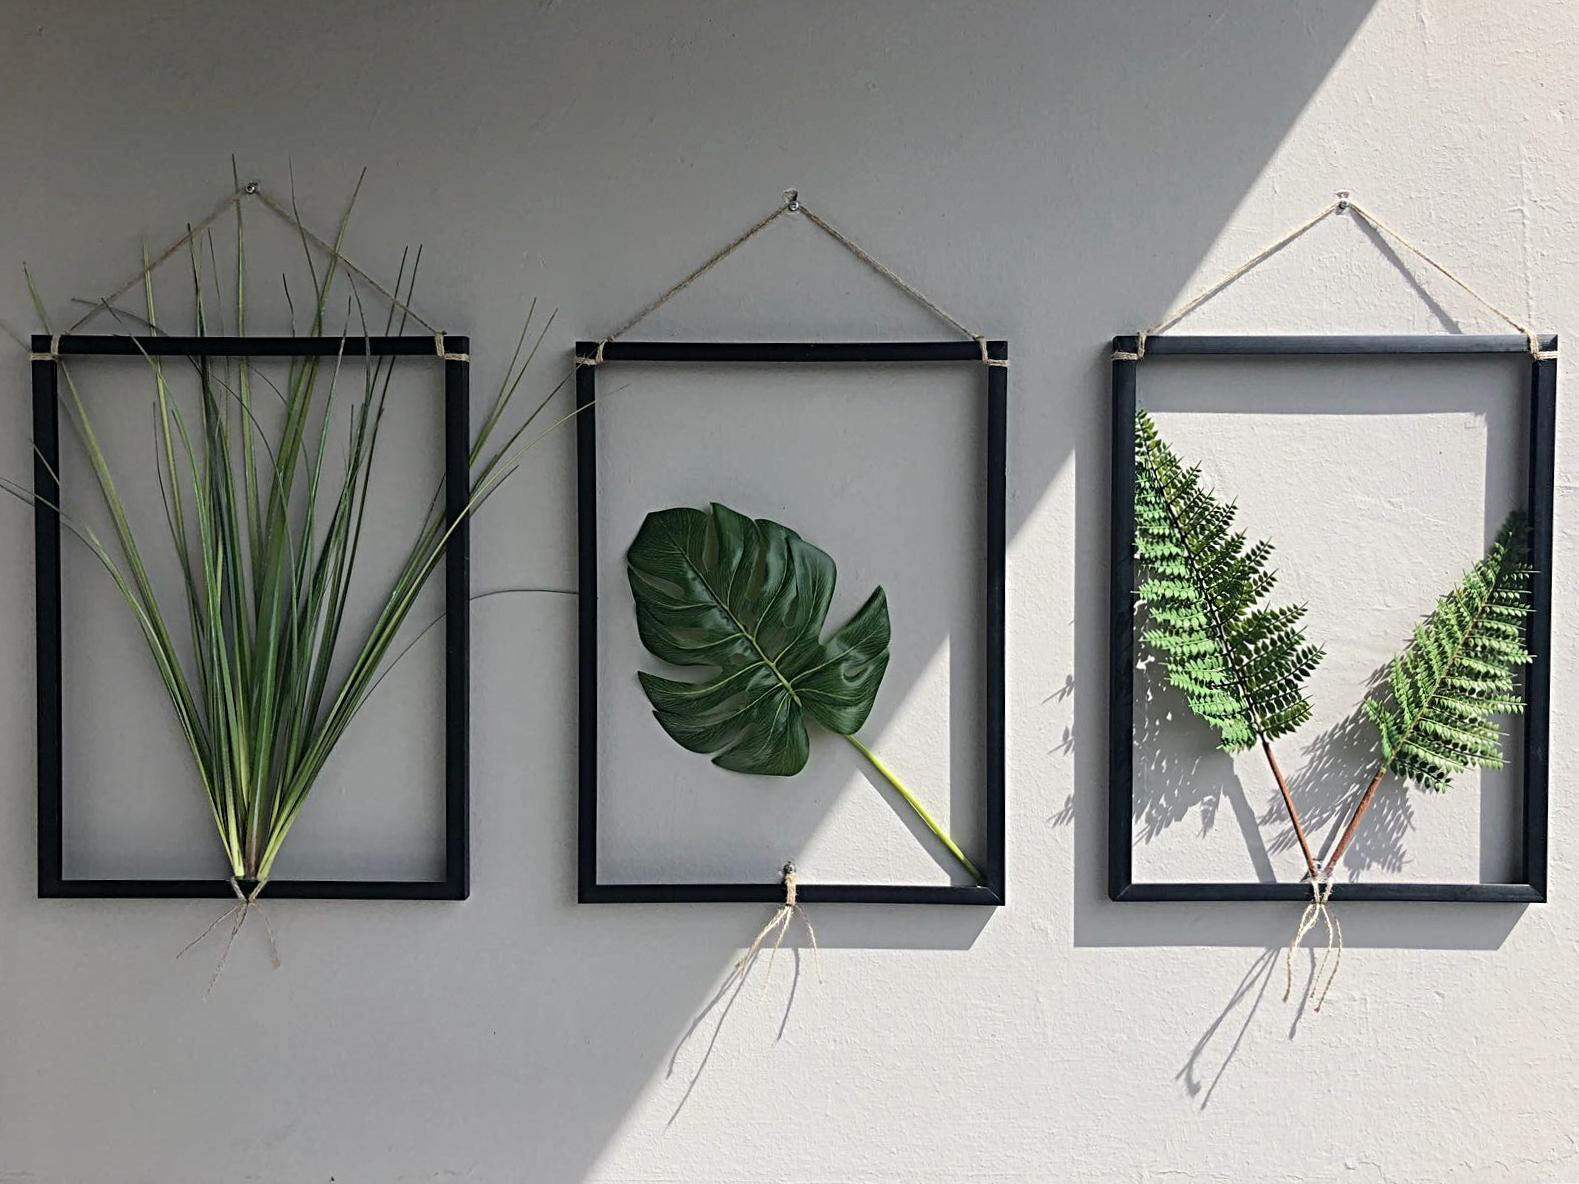 einzigartig selbstgemacht diys f r jeden tag. Black Bedroom Furniture Sets. Home Design Ideas